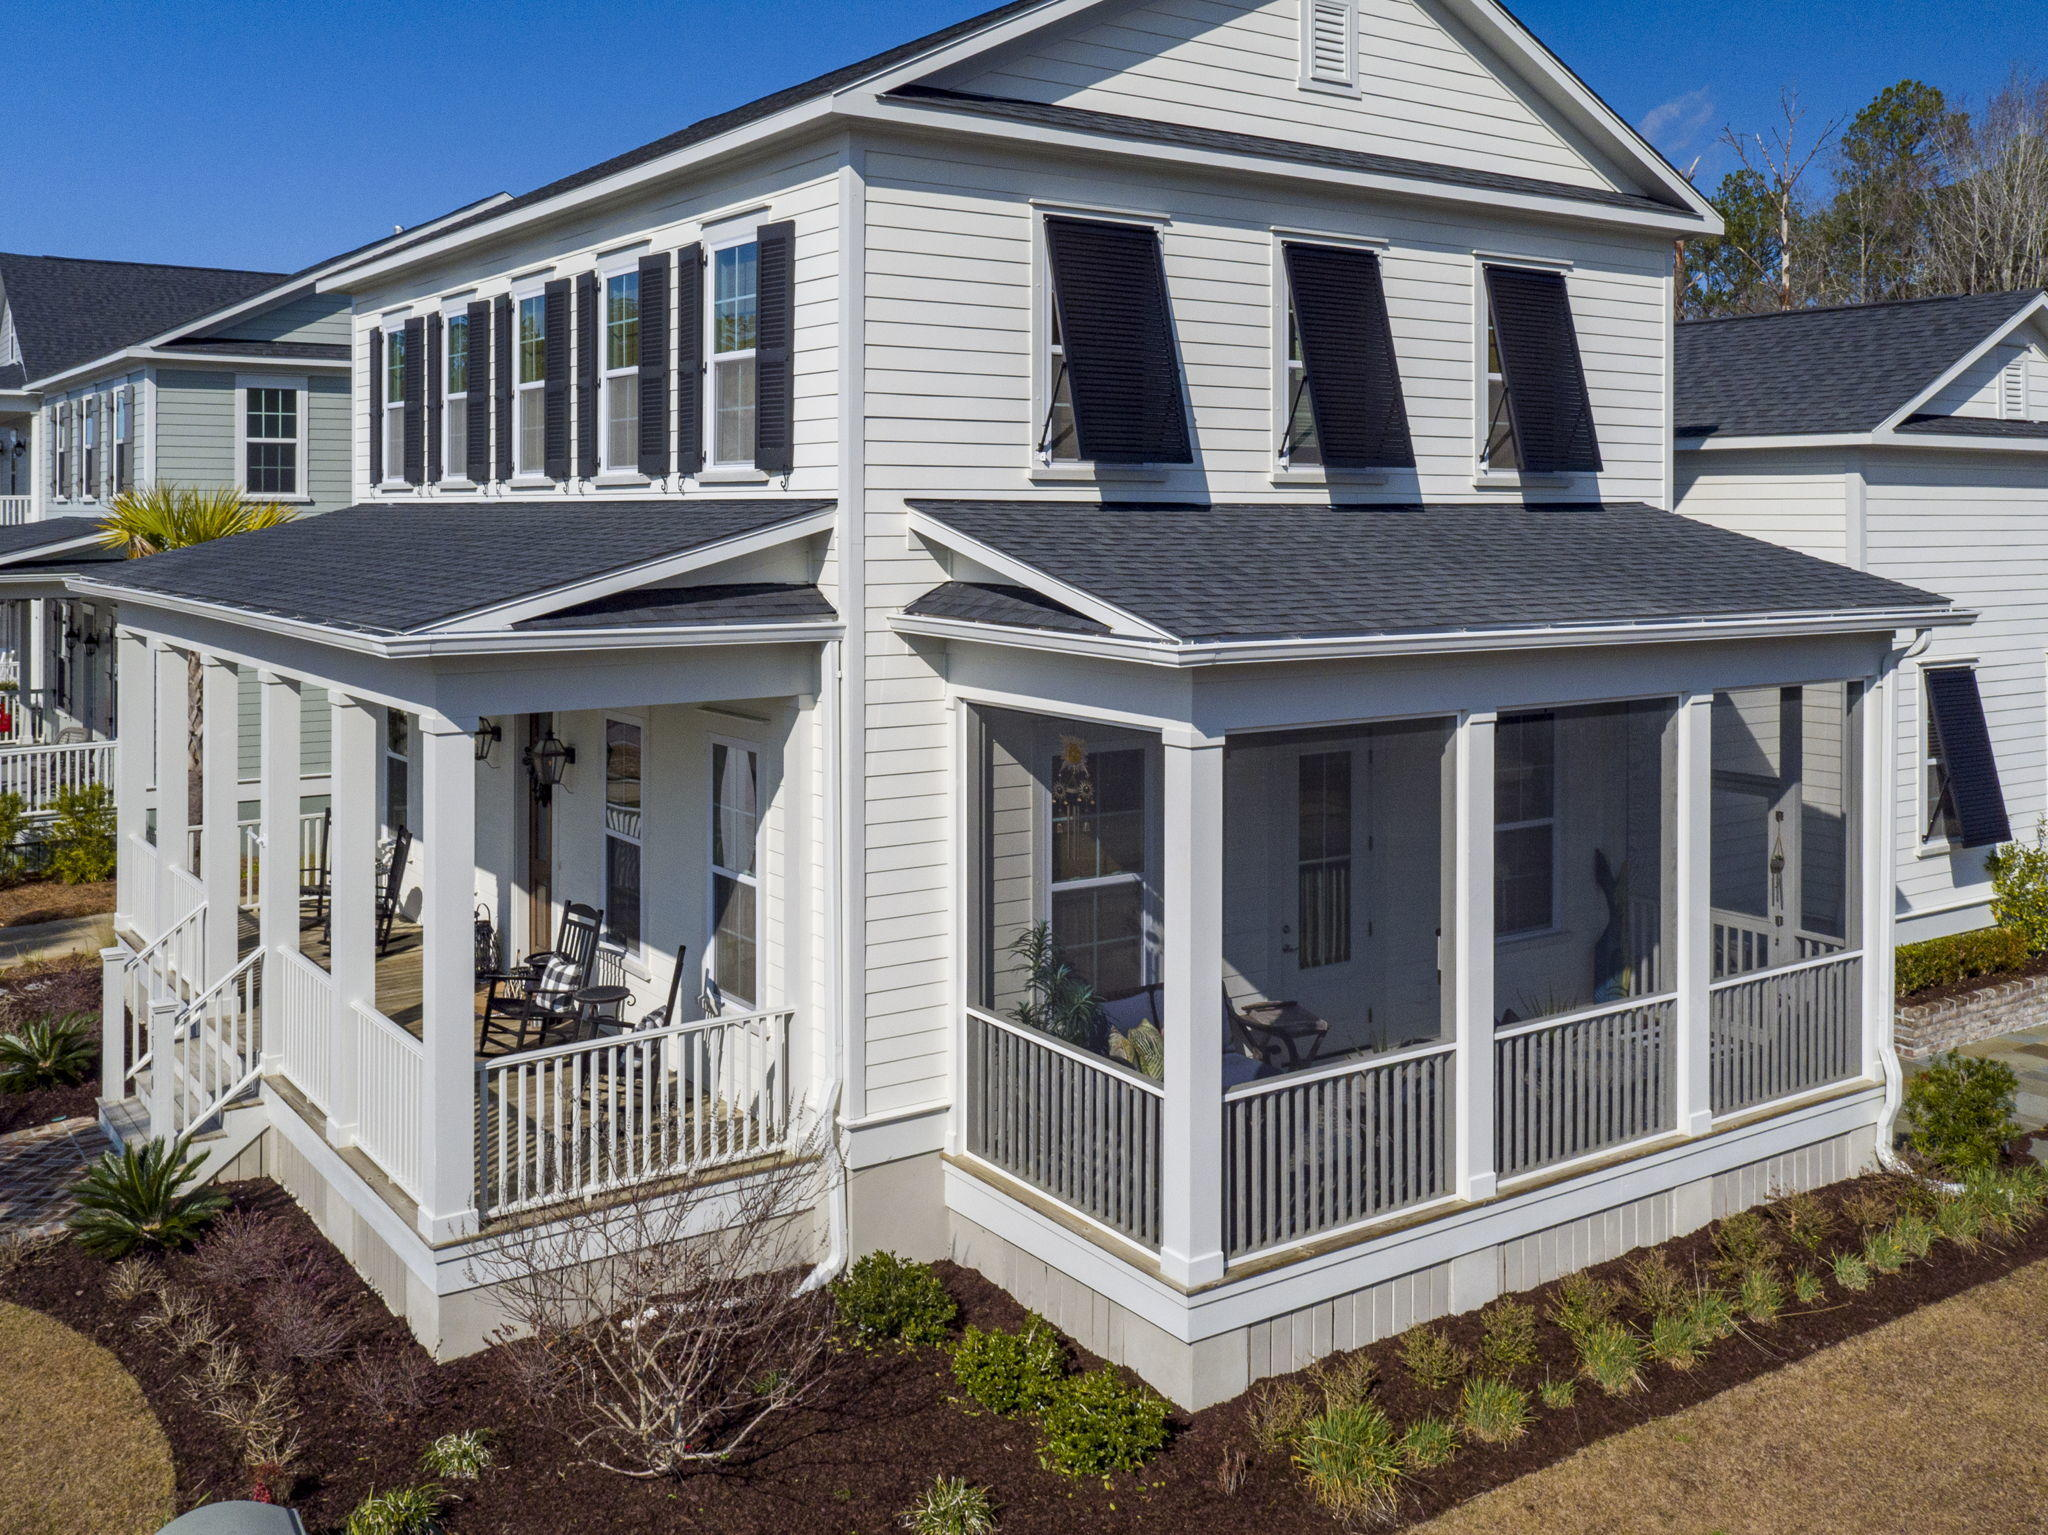 Carolina Park Homes For Sale - 3590 Backshore, Mount Pleasant, SC - 65